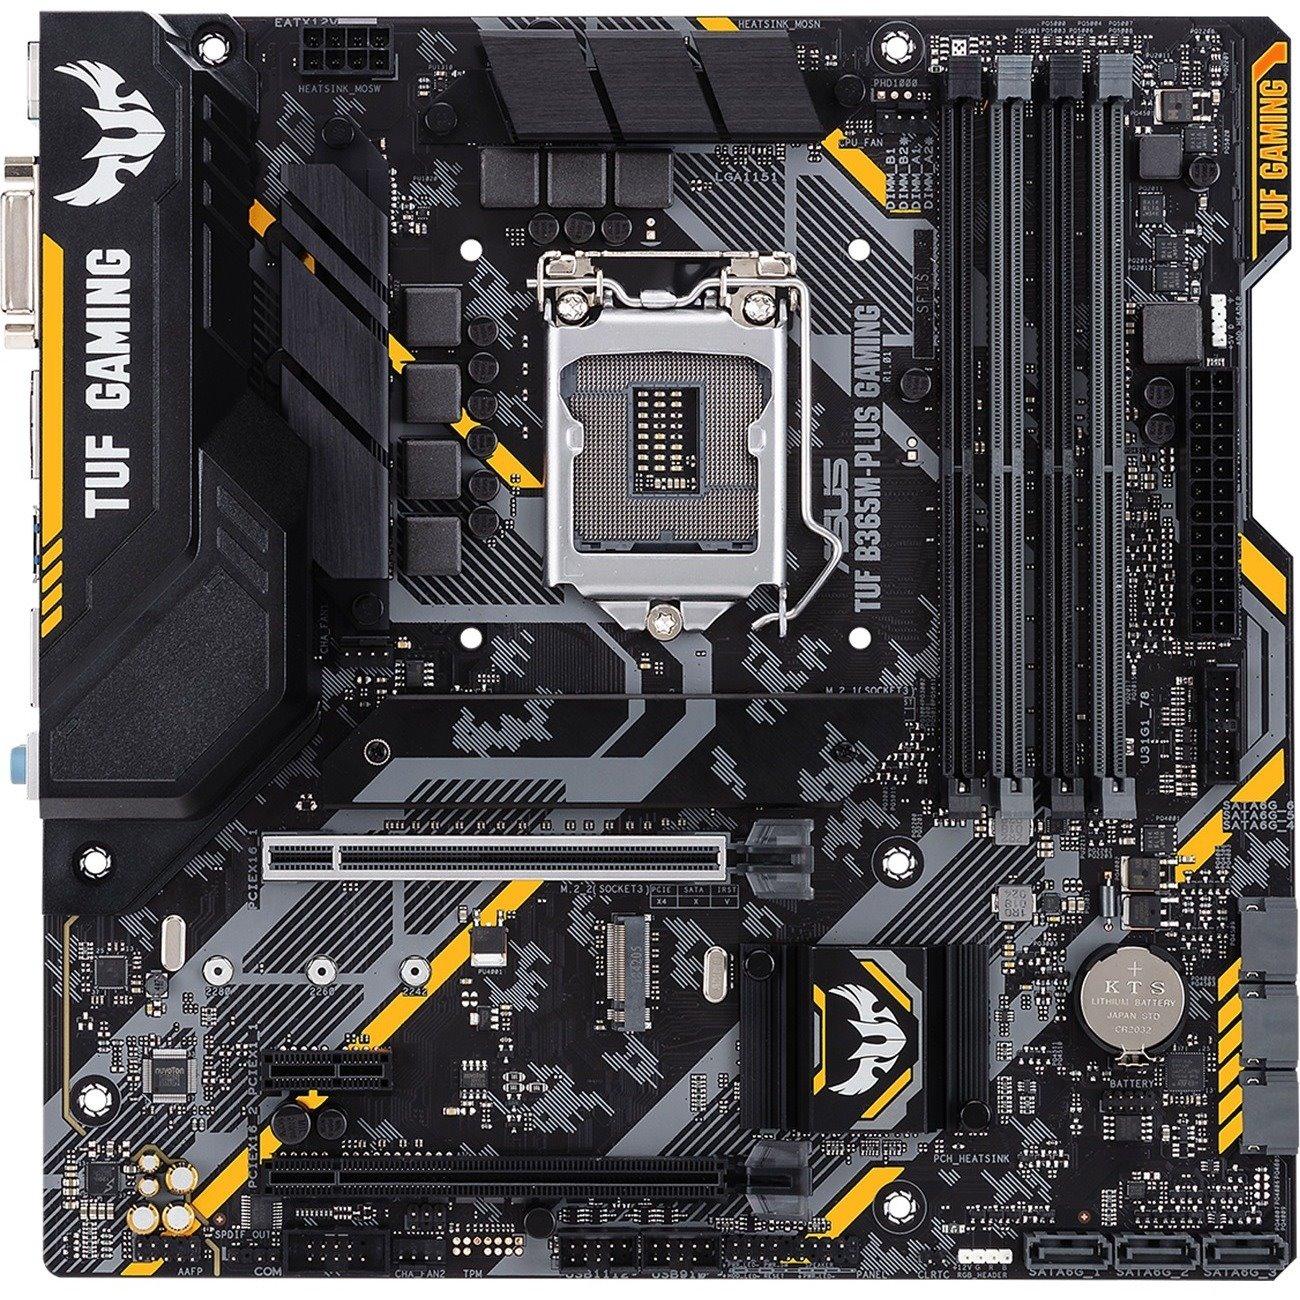 TUF B365M-PLUS GAMING Desktop Motherboard - Intel Chipset - Socket H4 LGA-1151